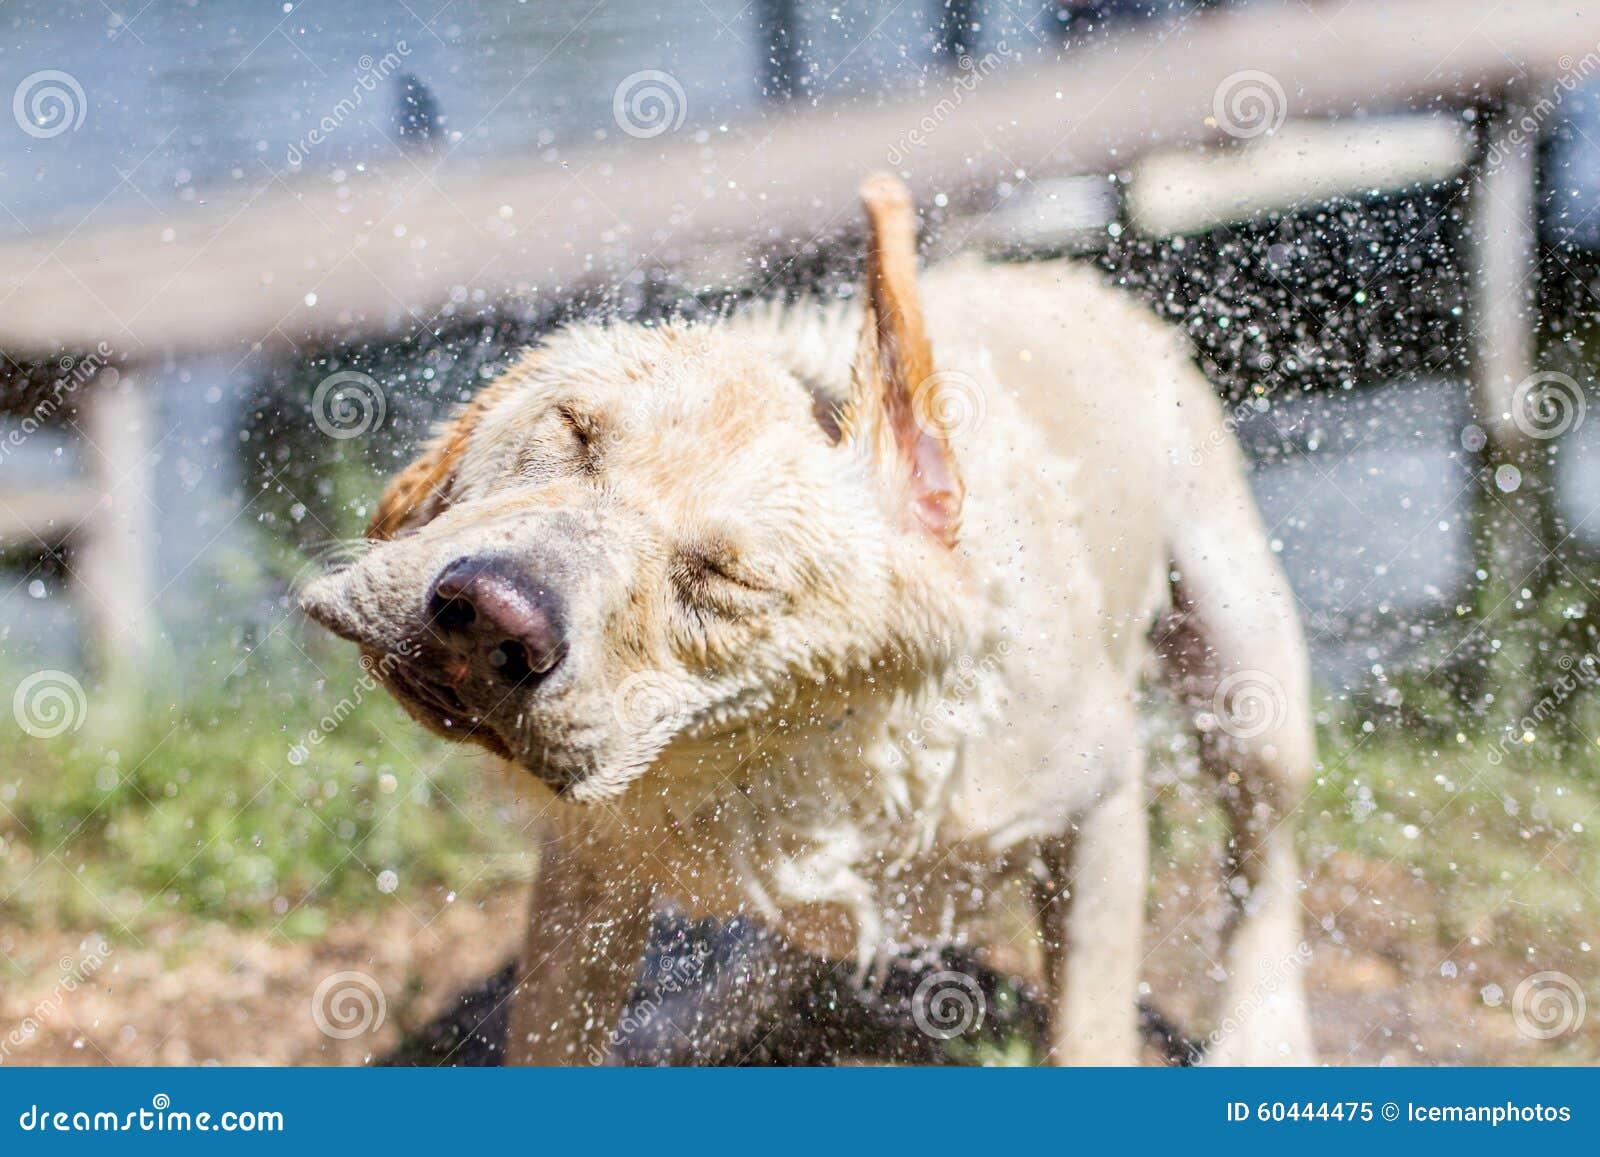 Splash Dog Food